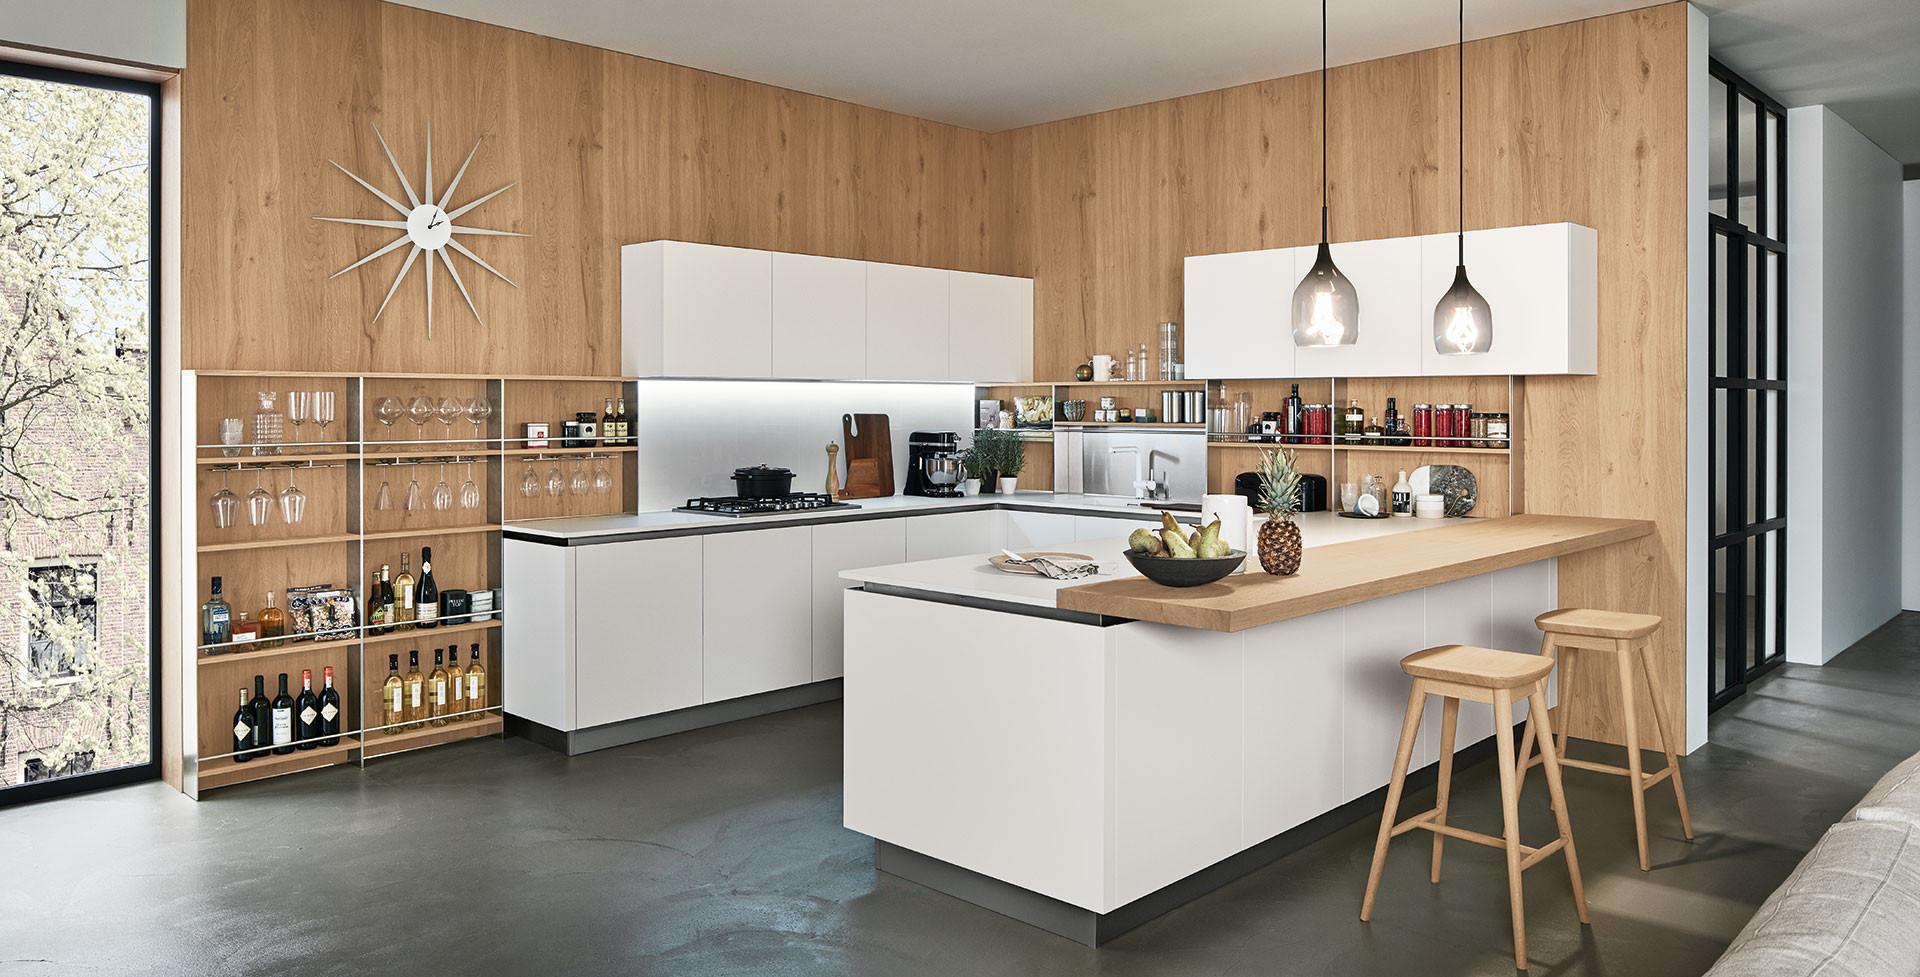 Modelli 3d Veneta Cucine.Cucina Oyster Veneta Cucine